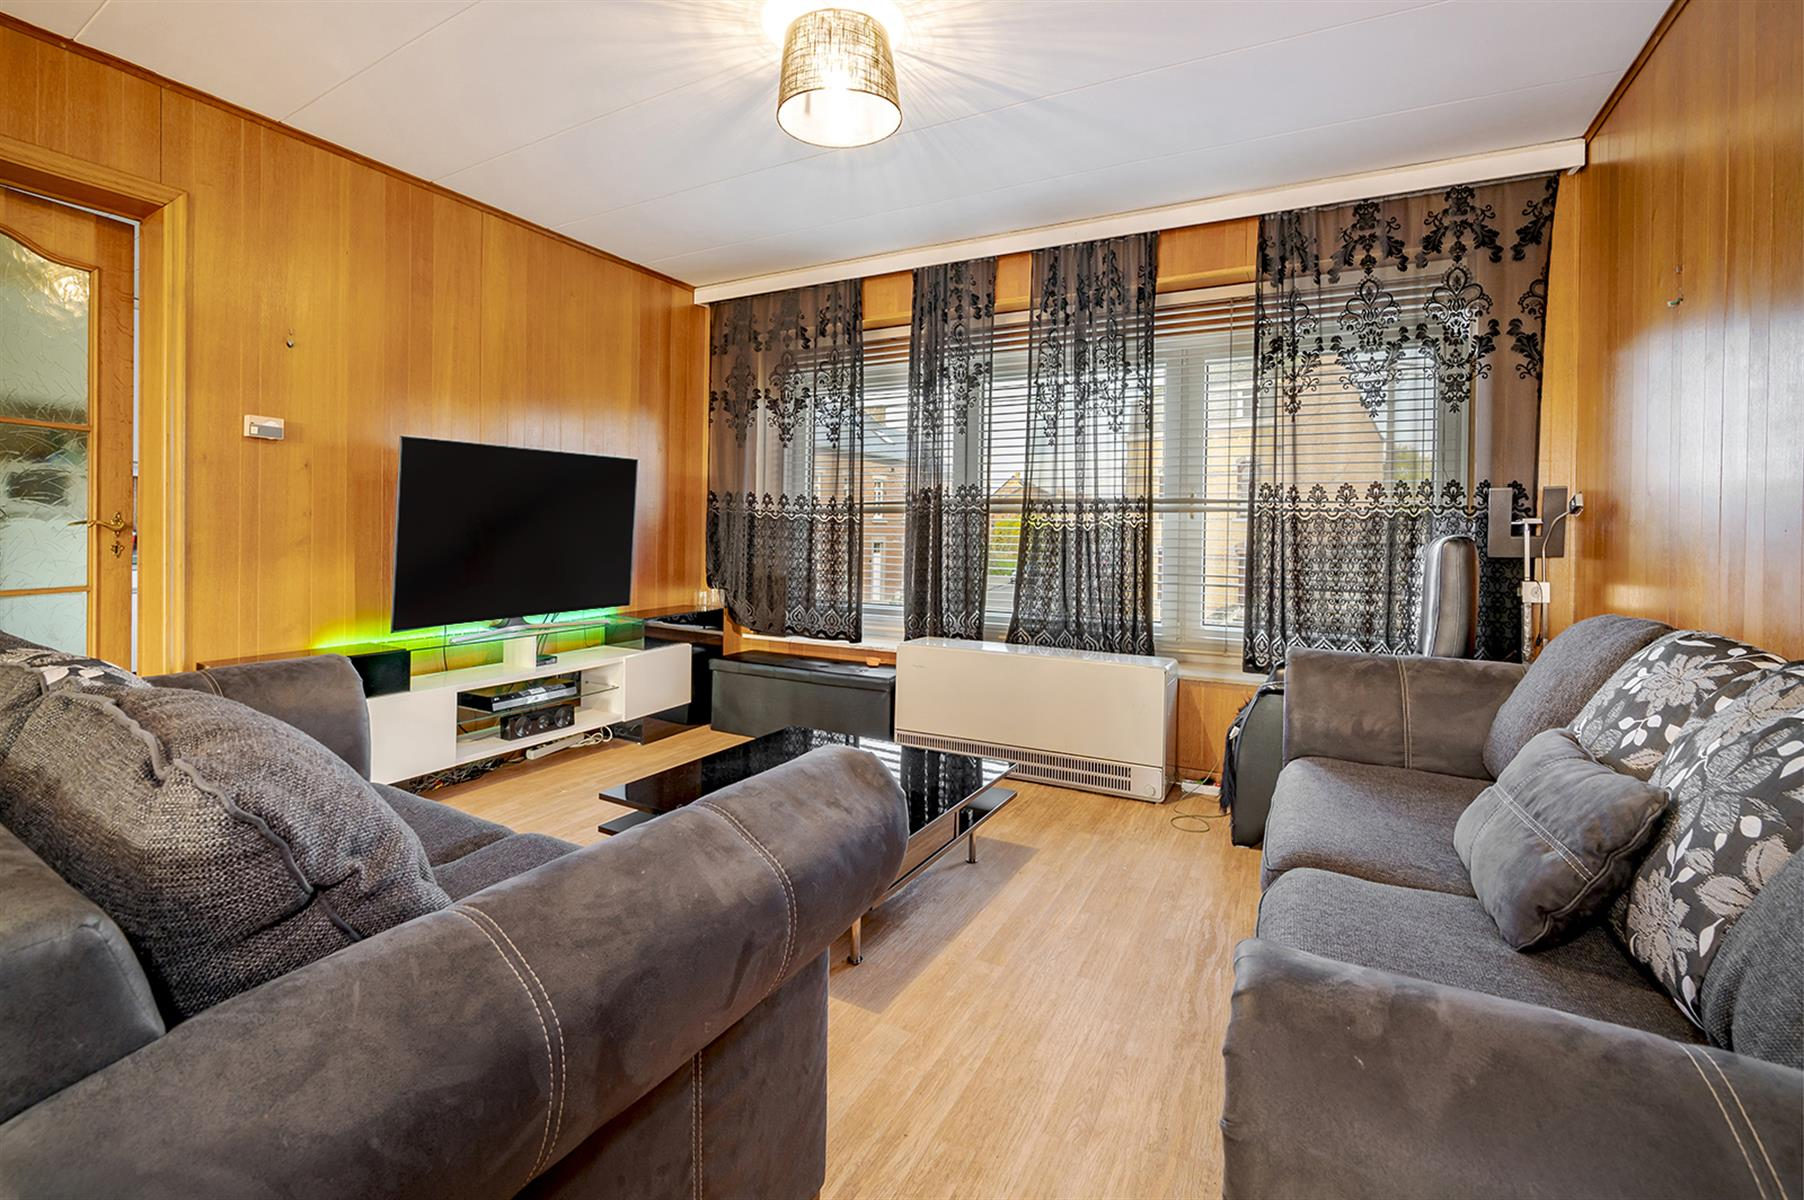 Appartement - Lincent Pellaines - #3888397-6